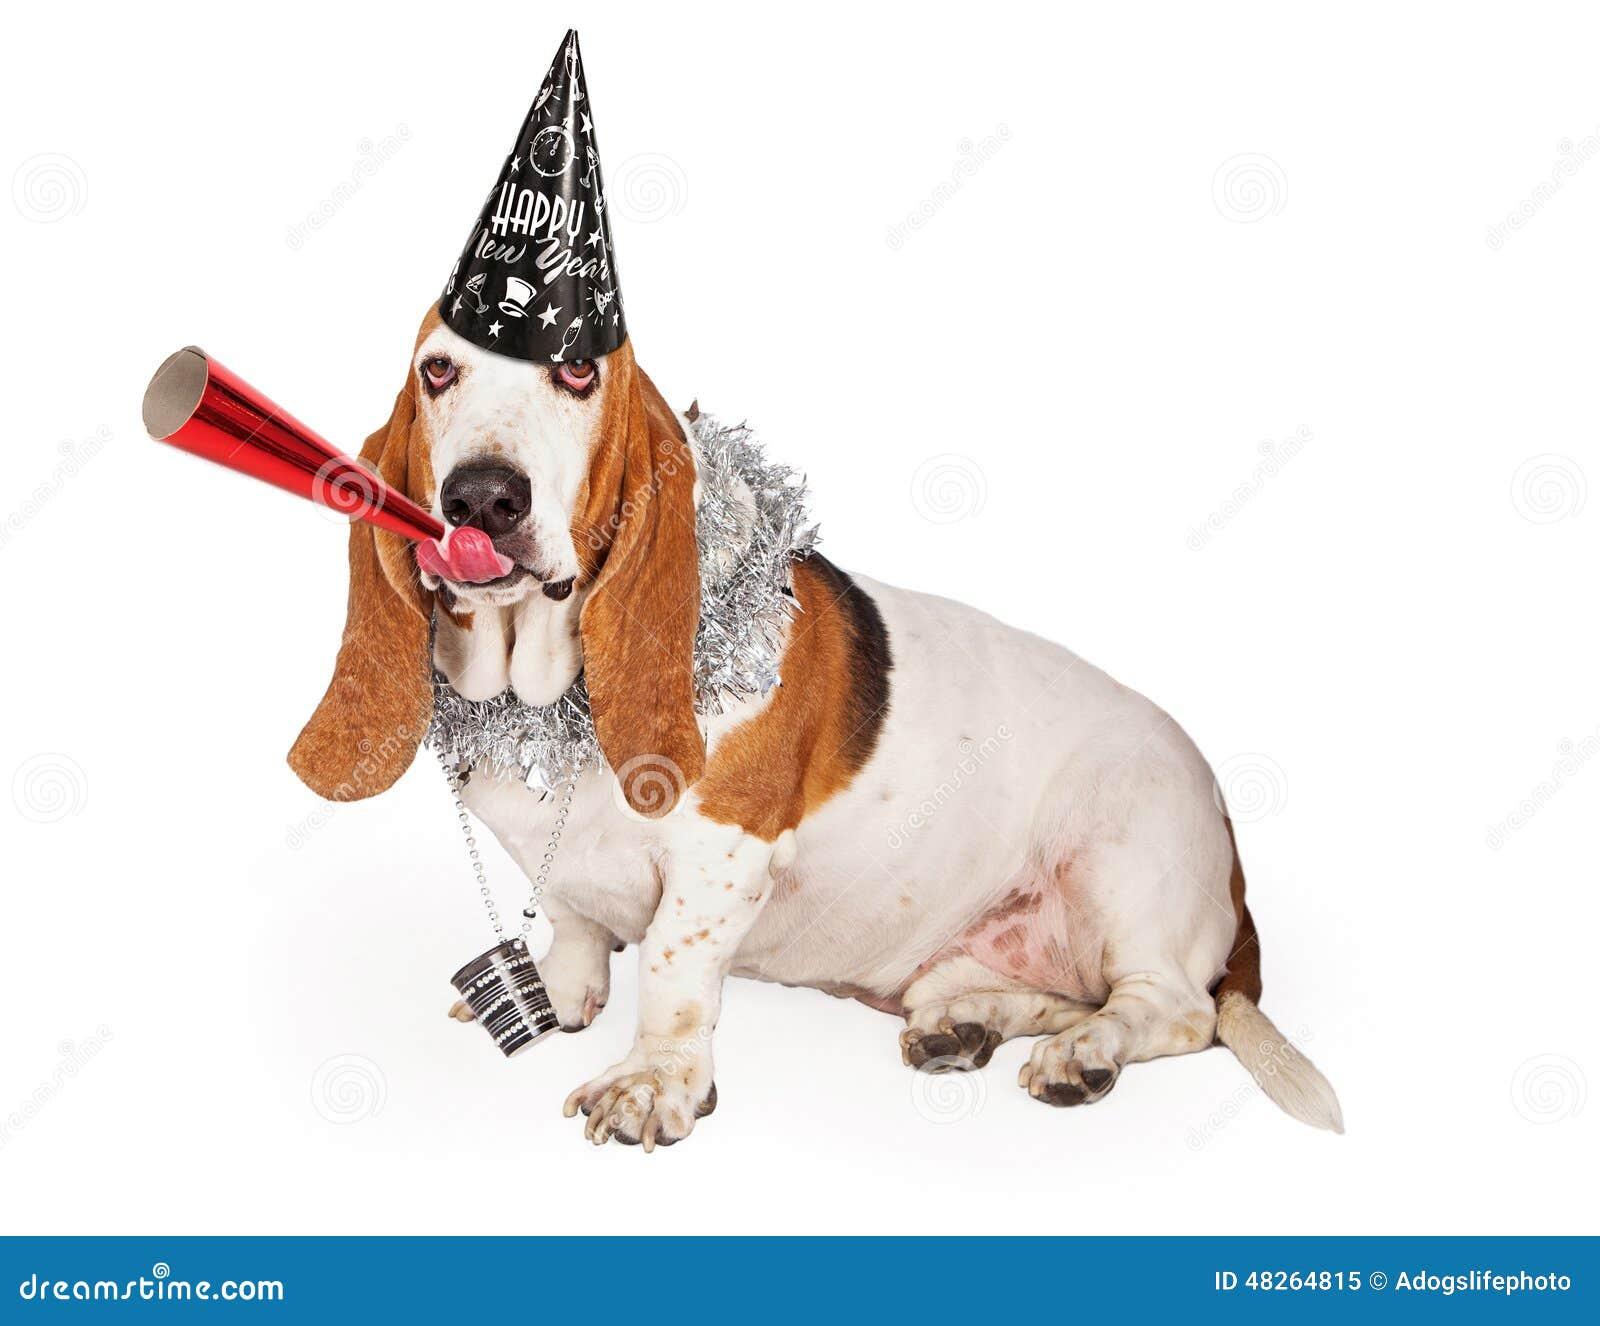 Basset Hound New Years Party Dog Stock Image Image Of Length Indoors 48264815